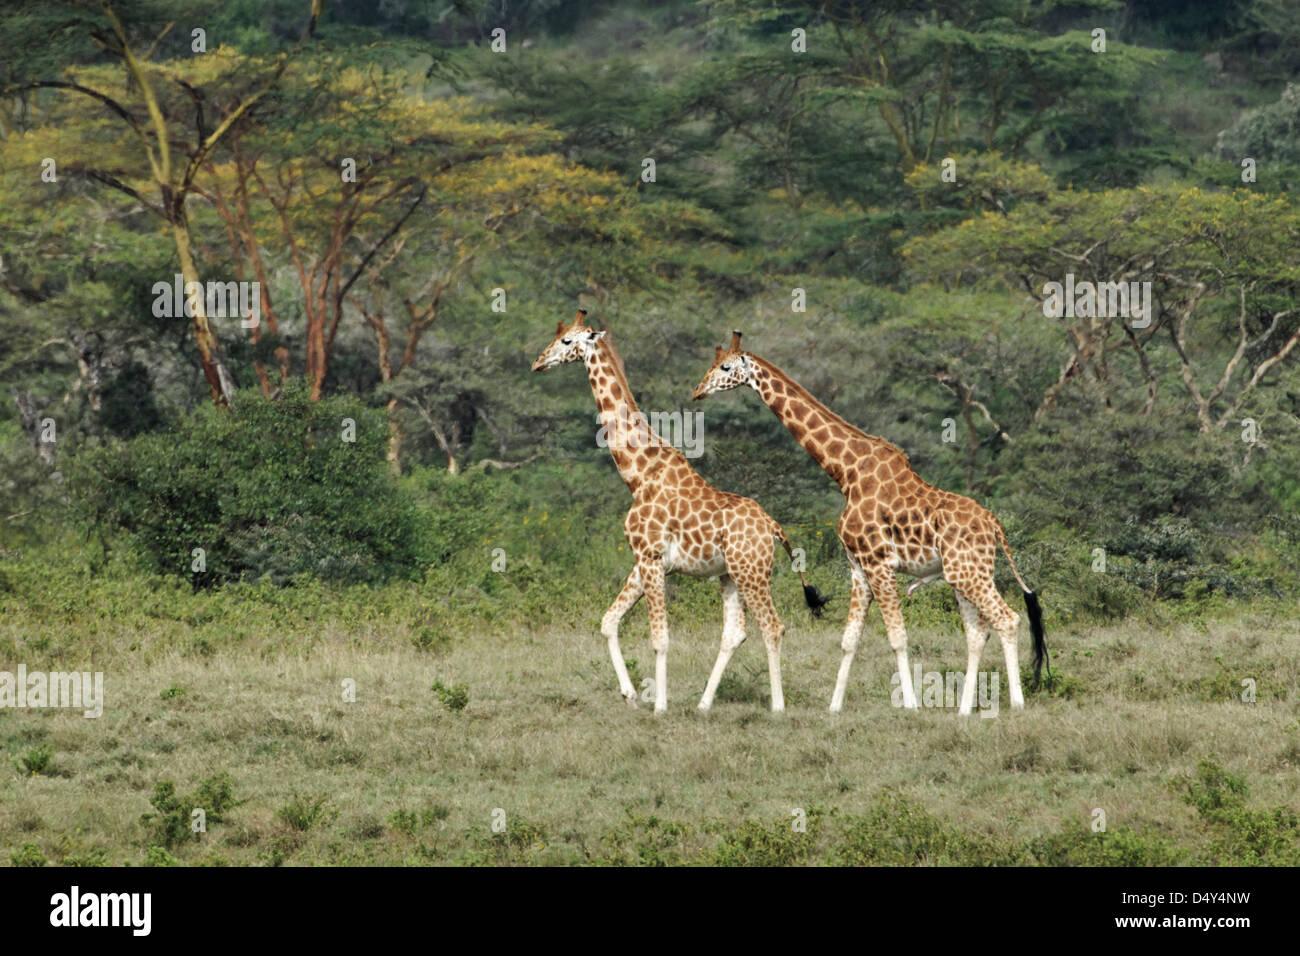 Rothschild's Giraffe, Lake Nakuru National Park, Kenya - Stock Image